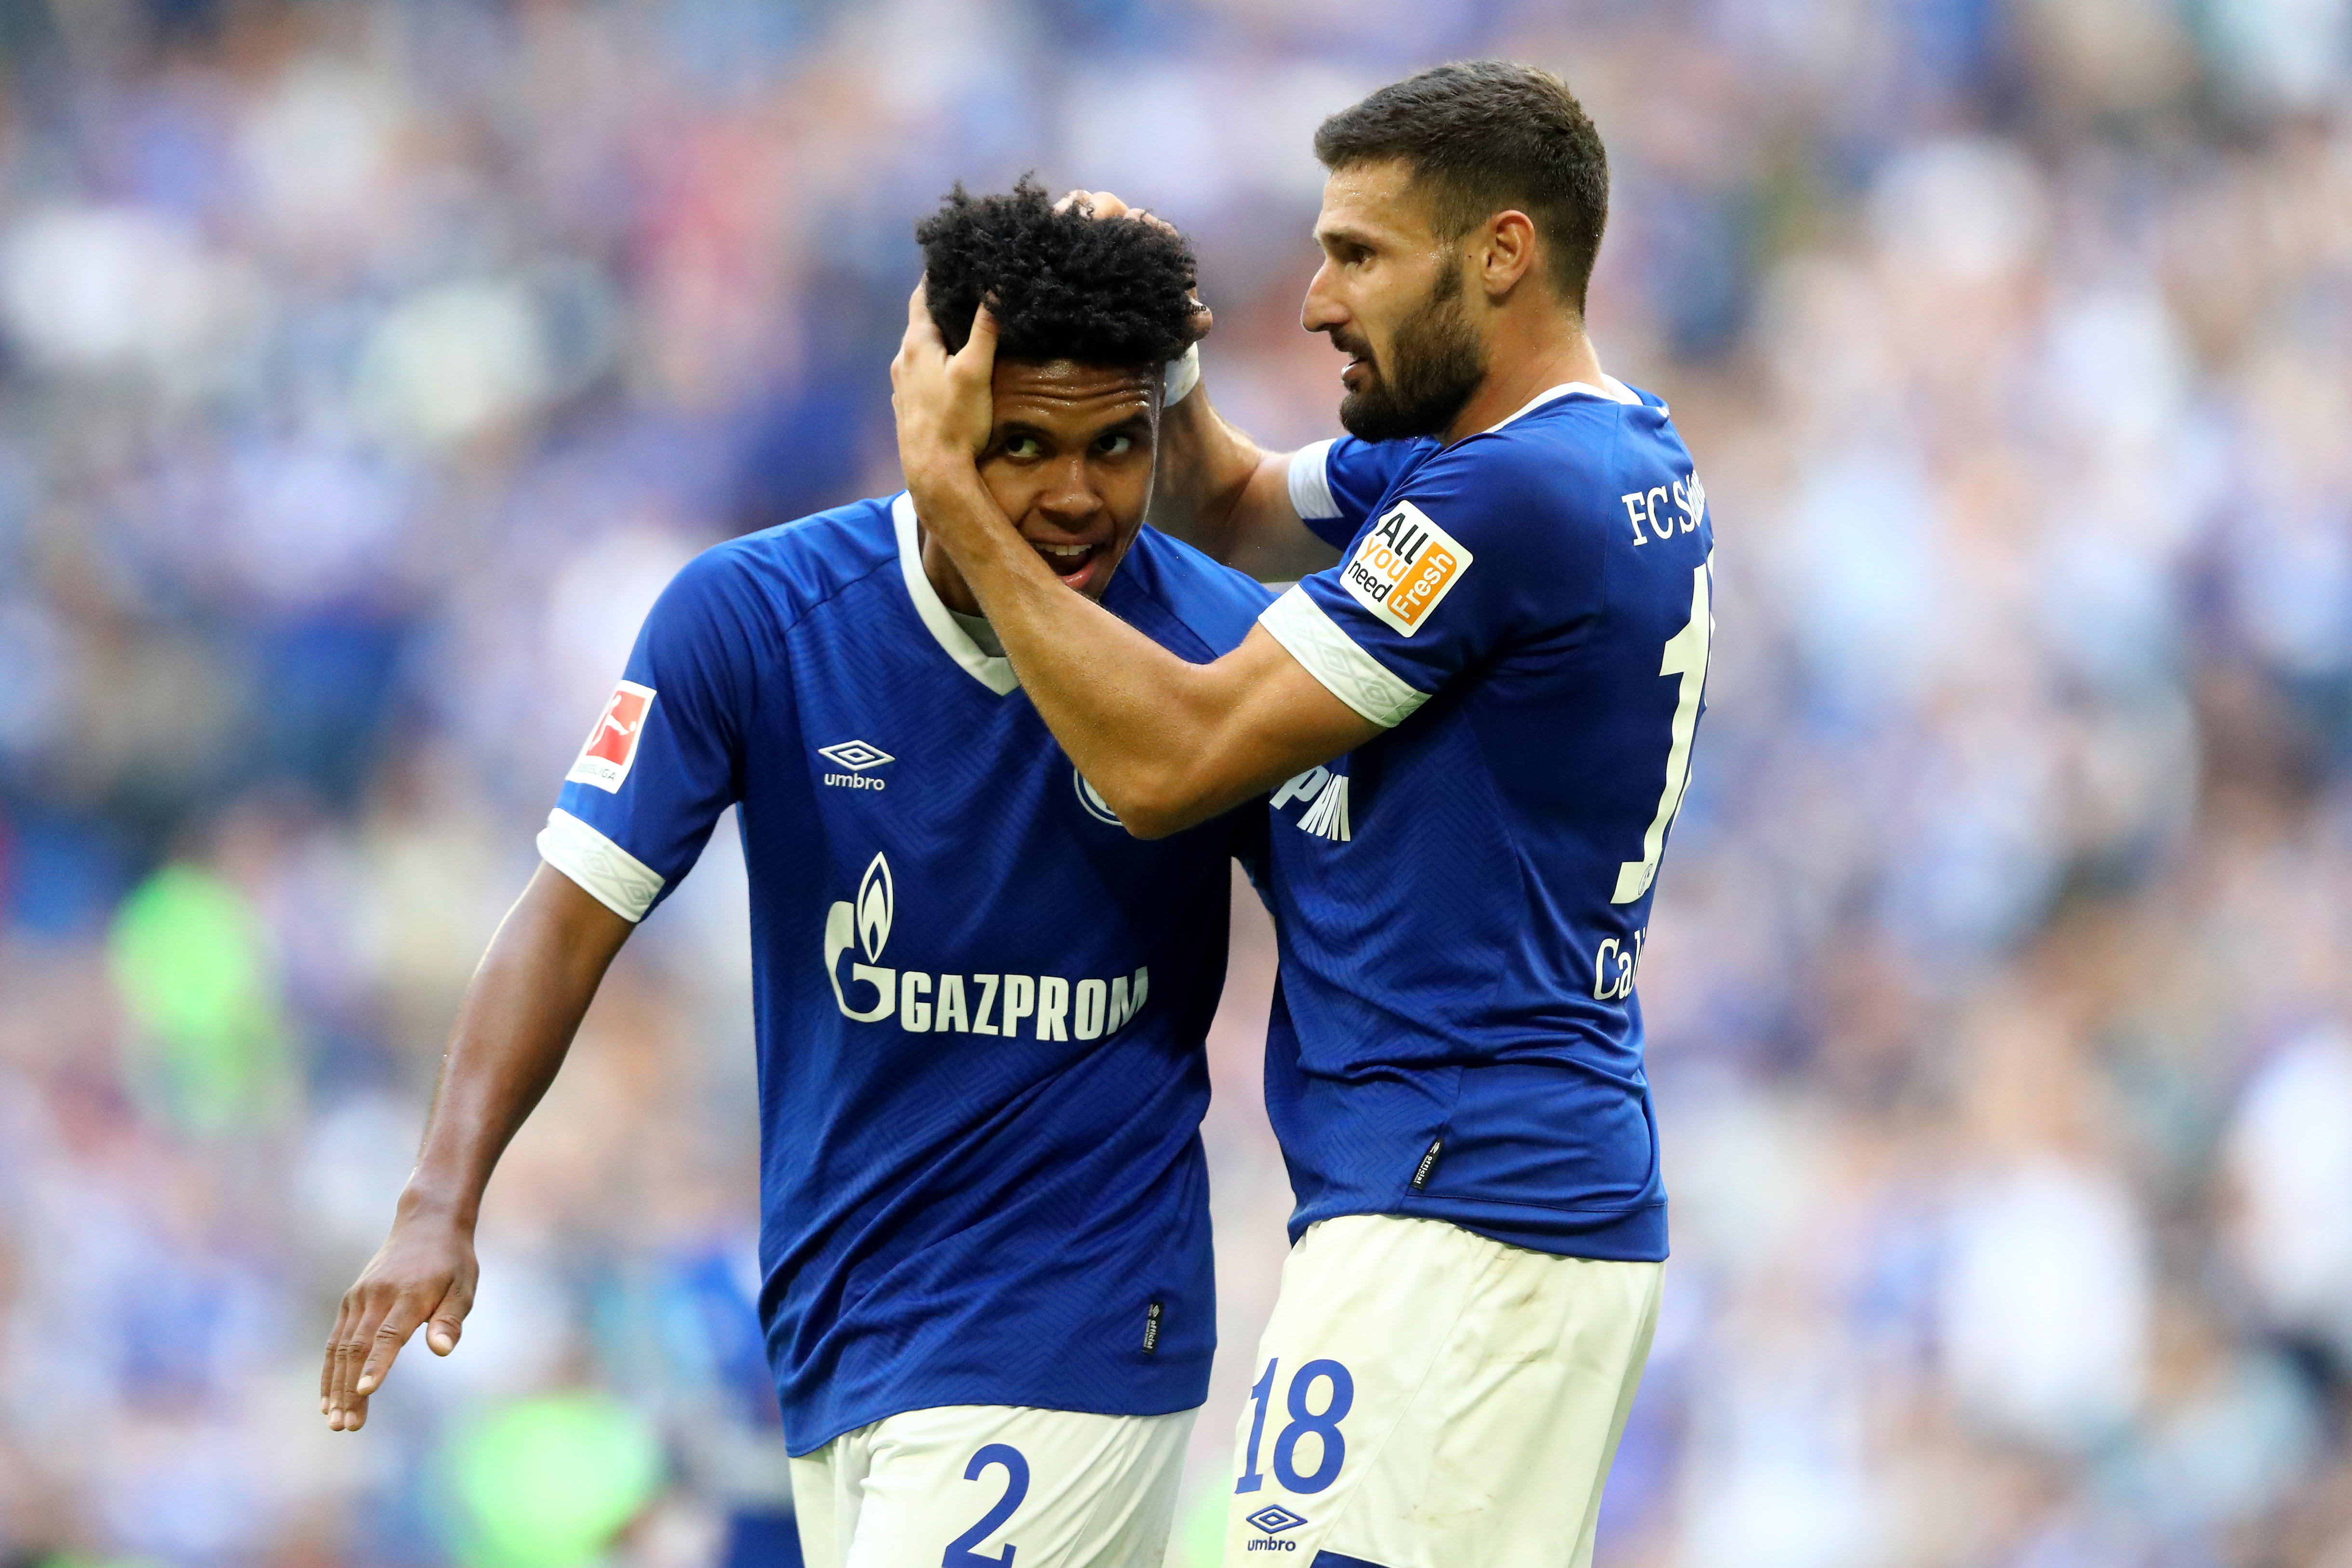 f6bf0915f Schalke makes it really hard for the USMNT to evaluate Weston McKennie